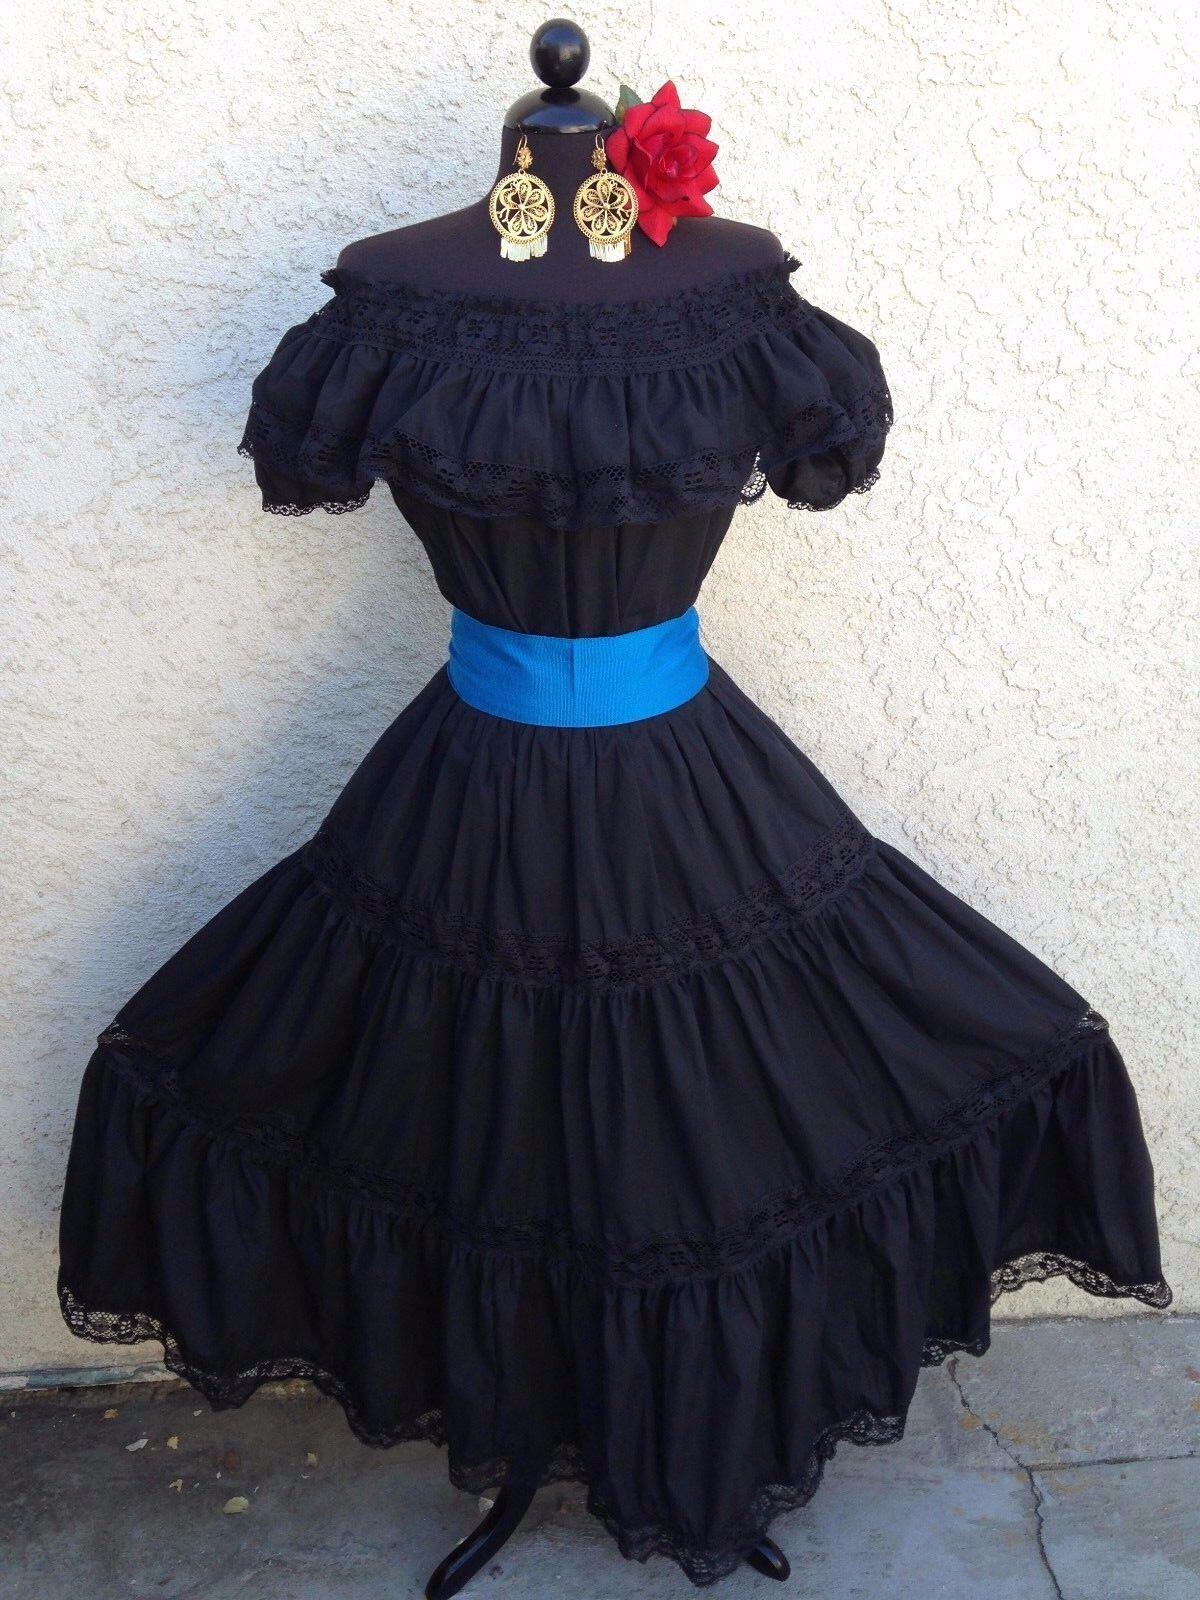 MEXICAN DRESS FIESTA, 5 DE MAYO,DAY OF THE DEAD OFF SHOULDER W RUFFLE 2 PIECE